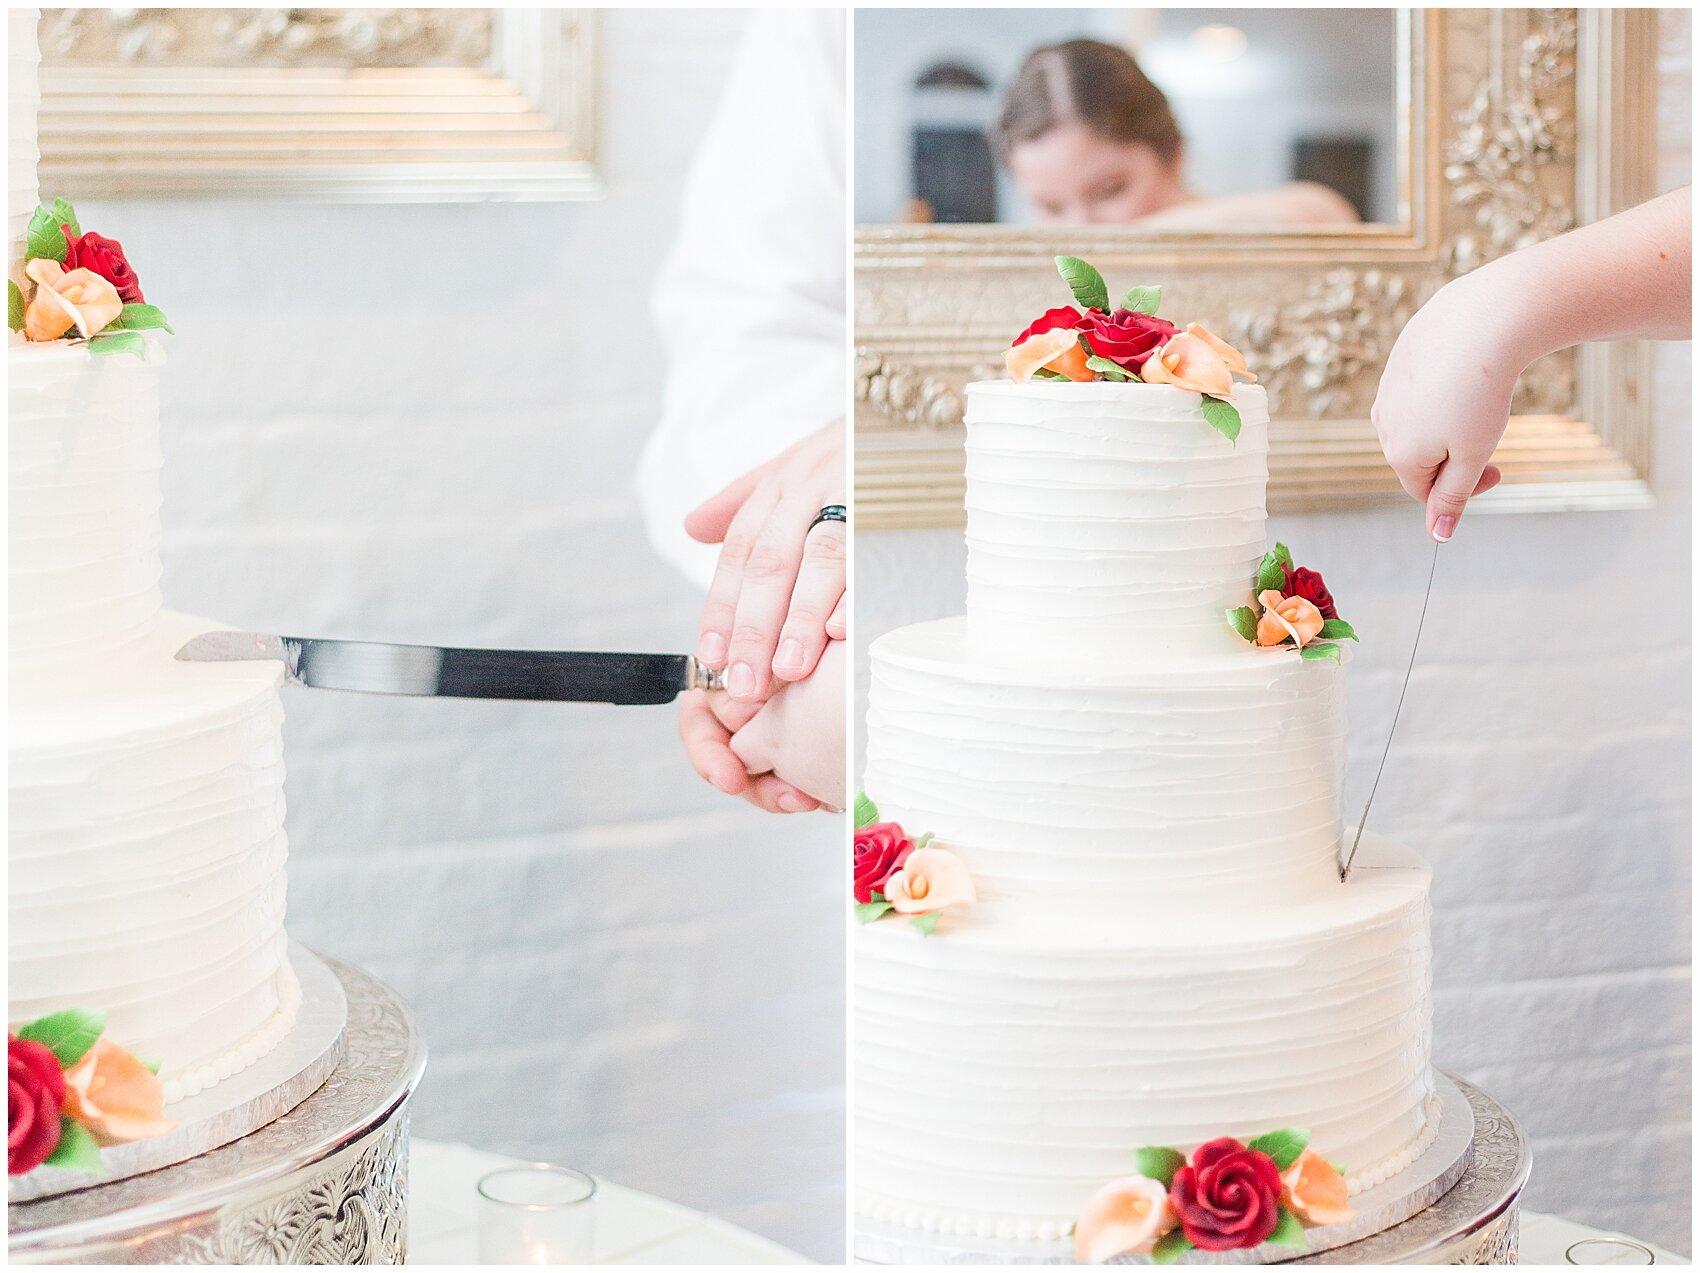 HOW-TO-CUT-A-WEDDING-CAKE_0003.jpg